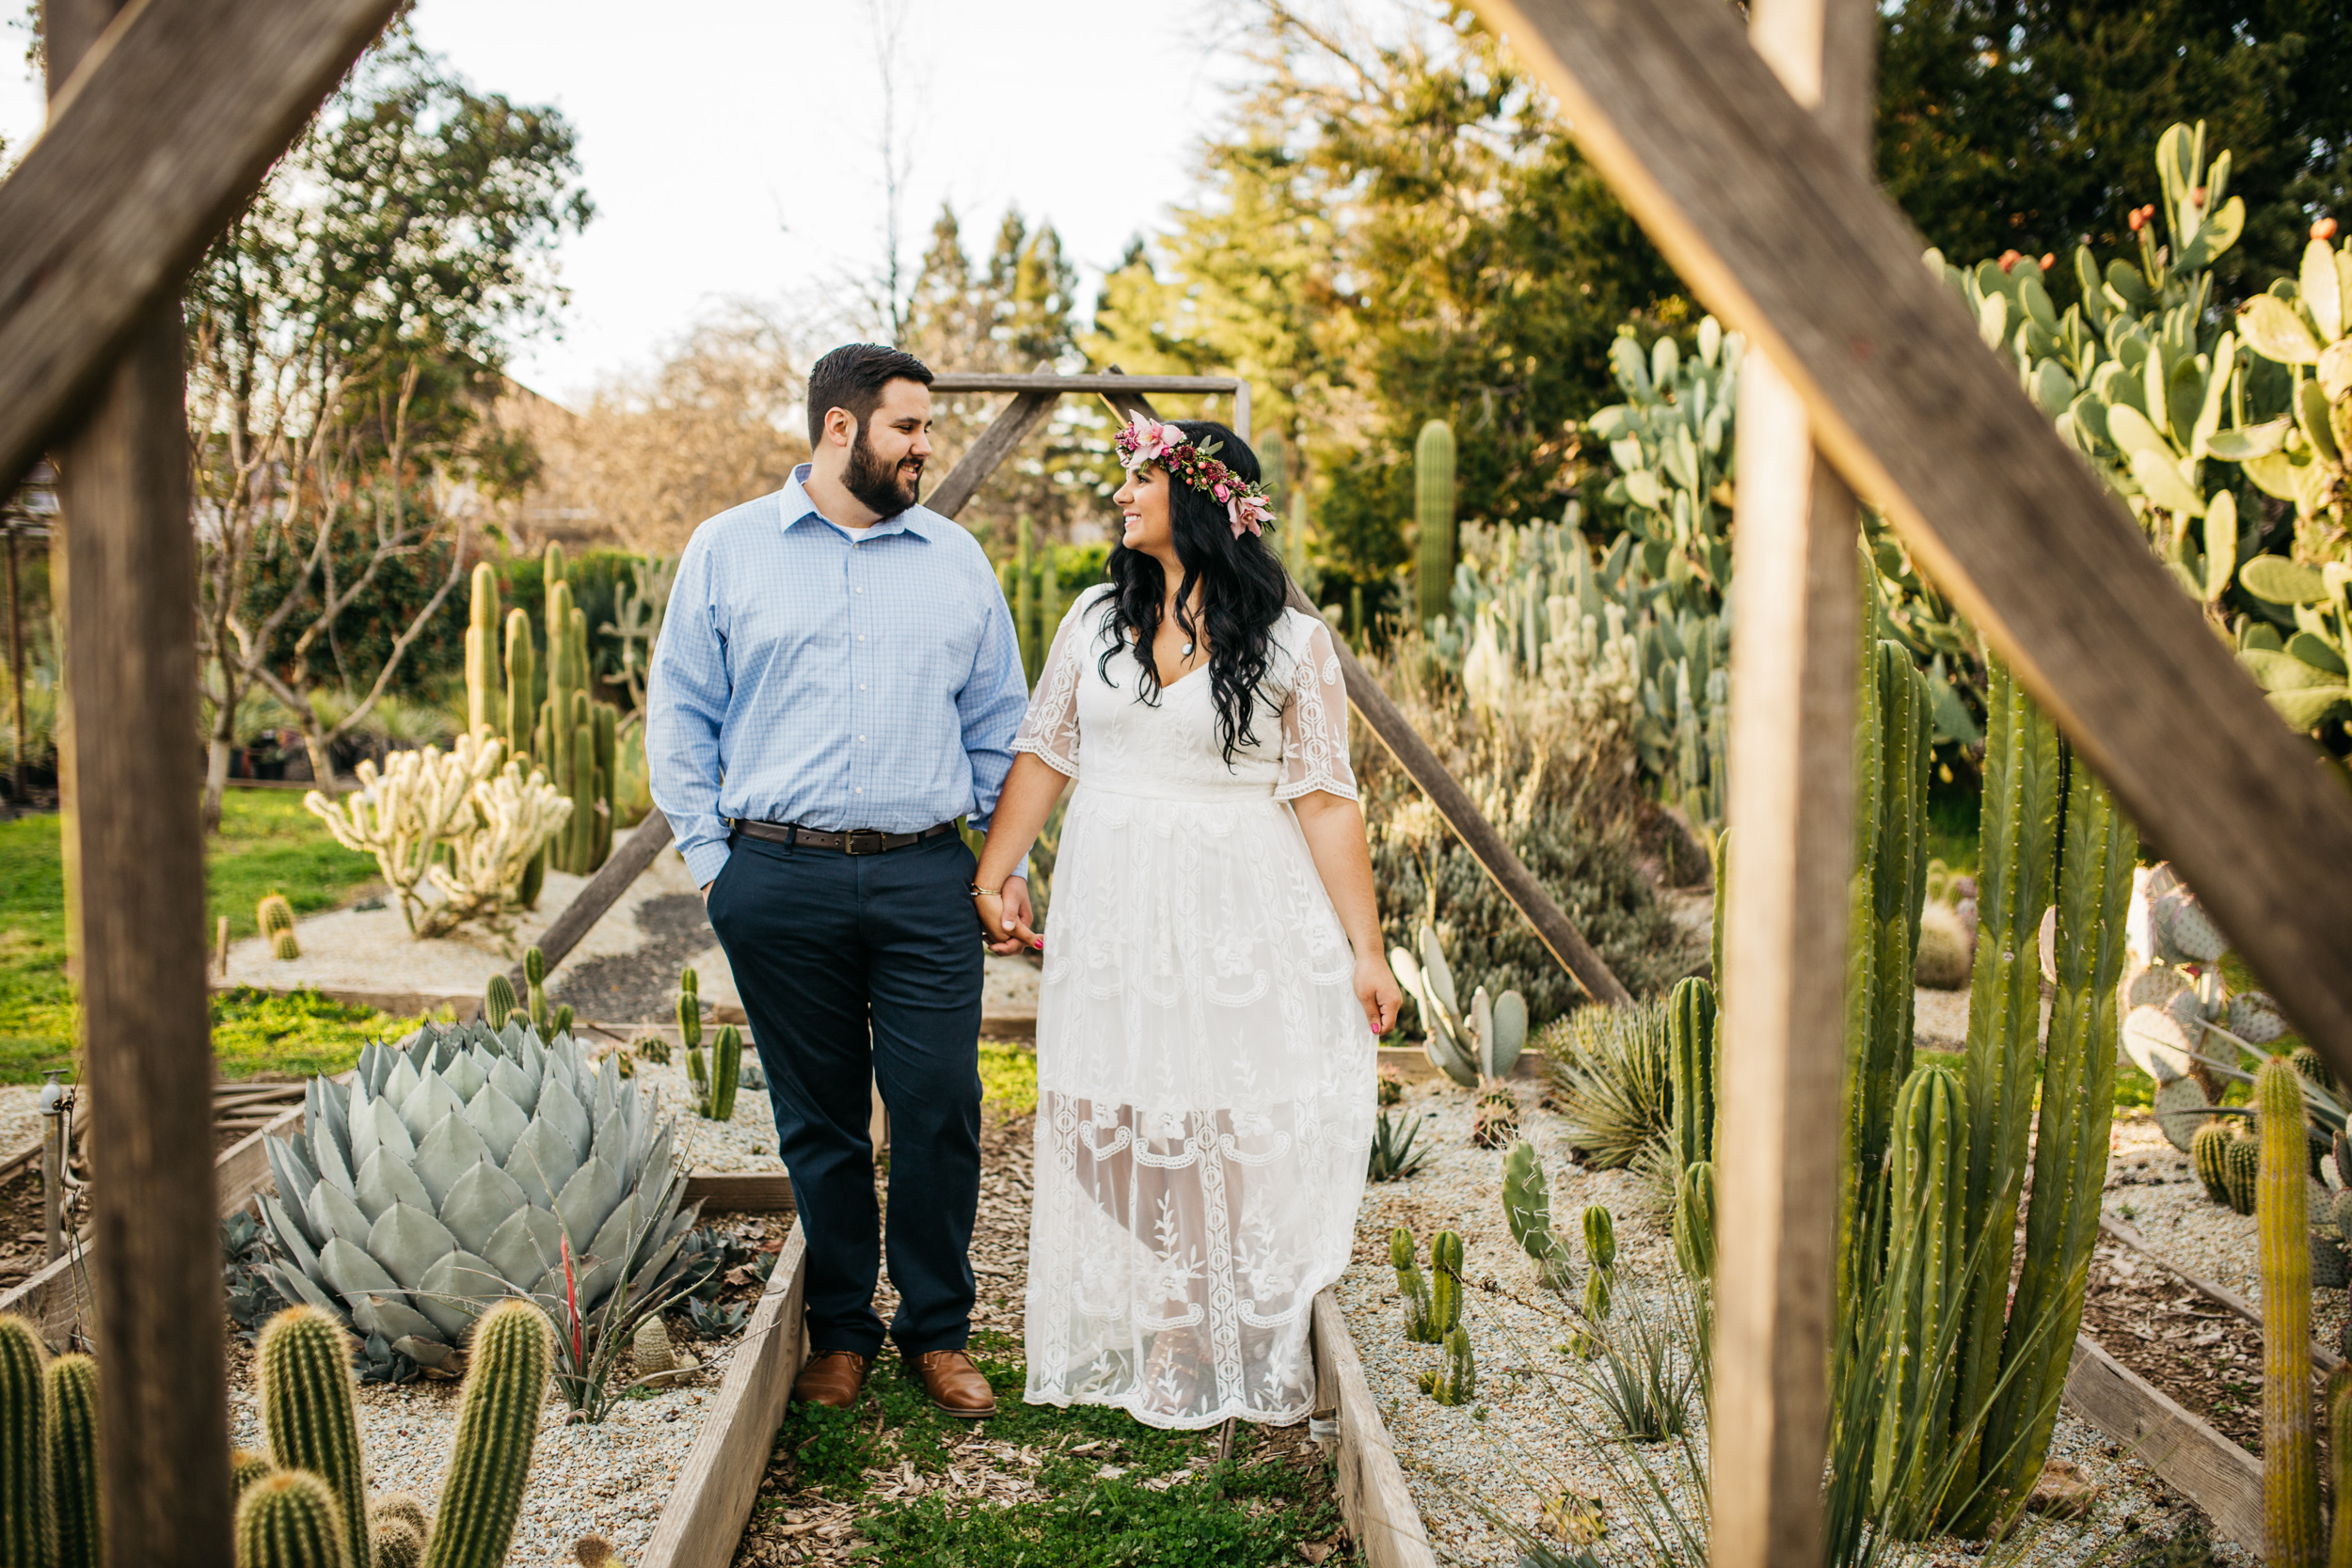 Engagement Photos-Ranalla Photo and Films-38.jpg